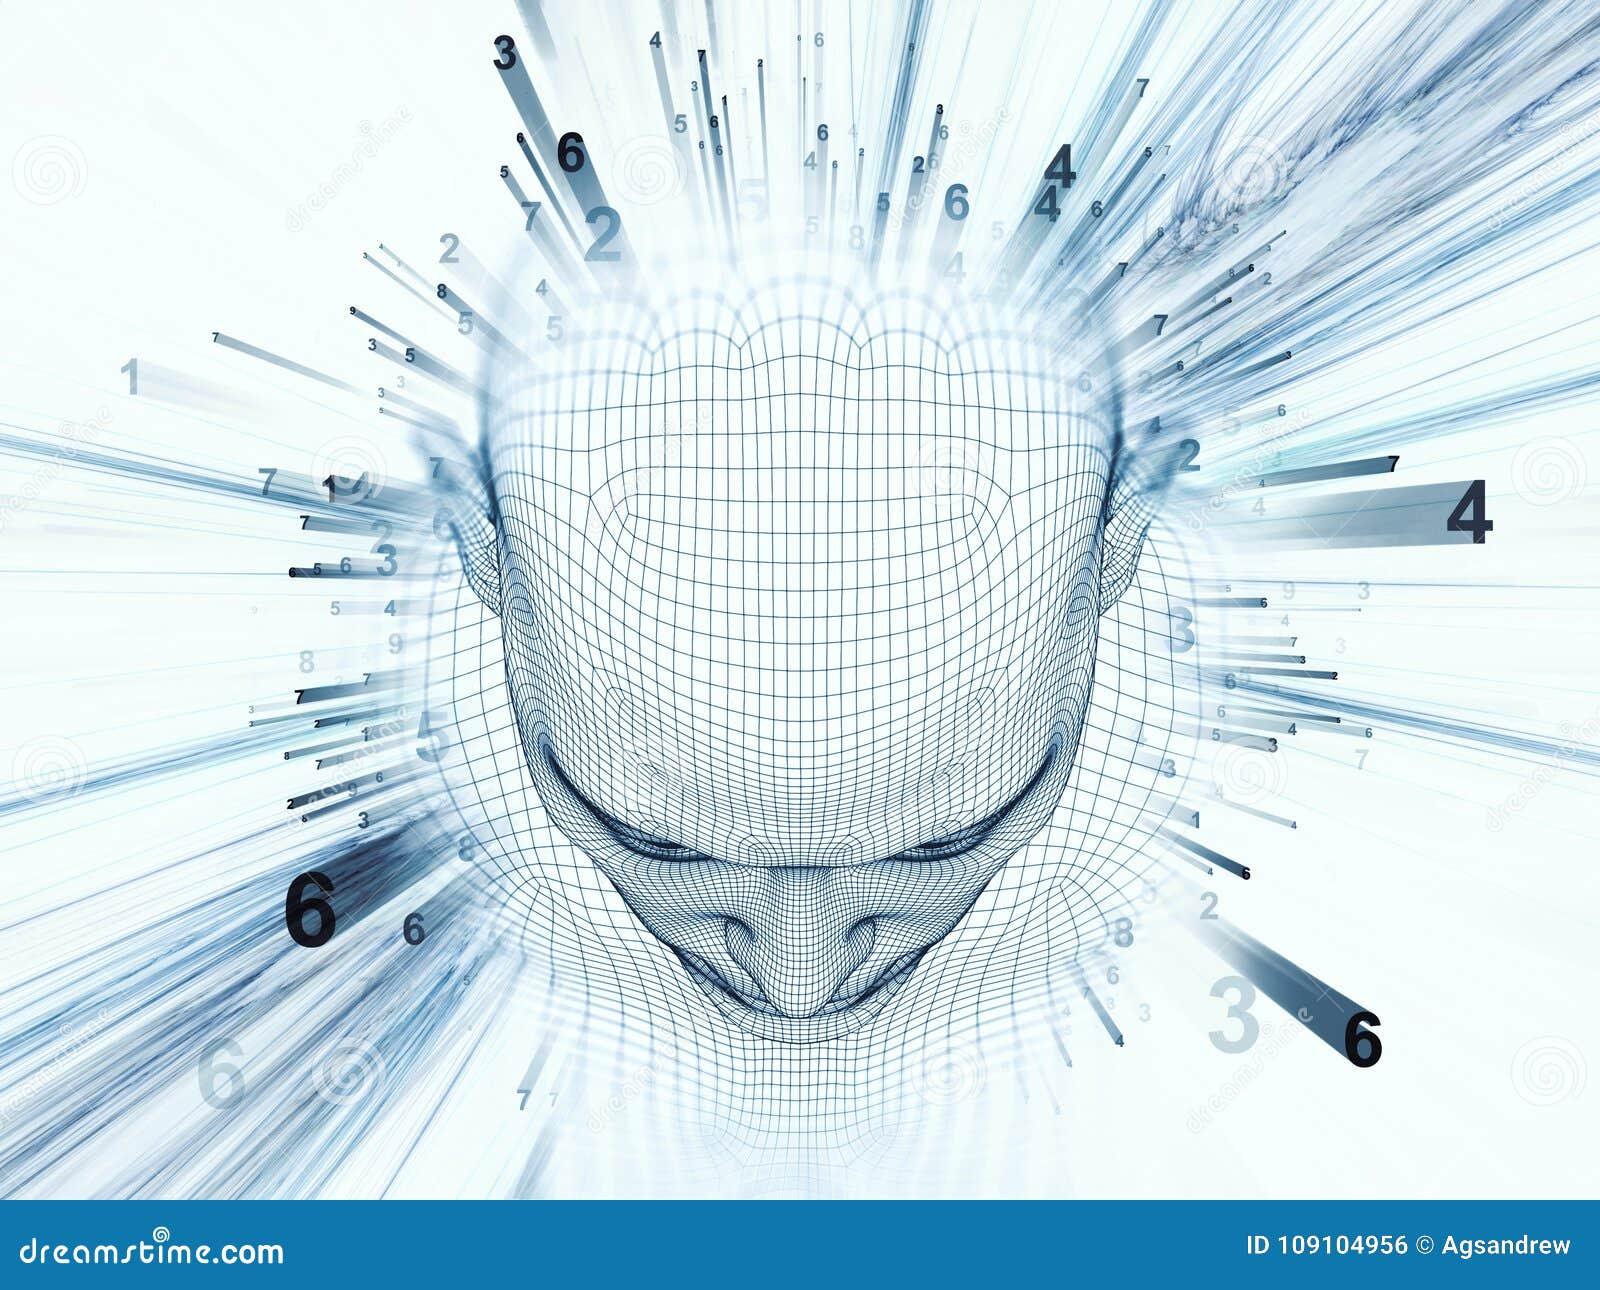 Spheres of the Mind stock illustration. Illustration of grid - 109104956